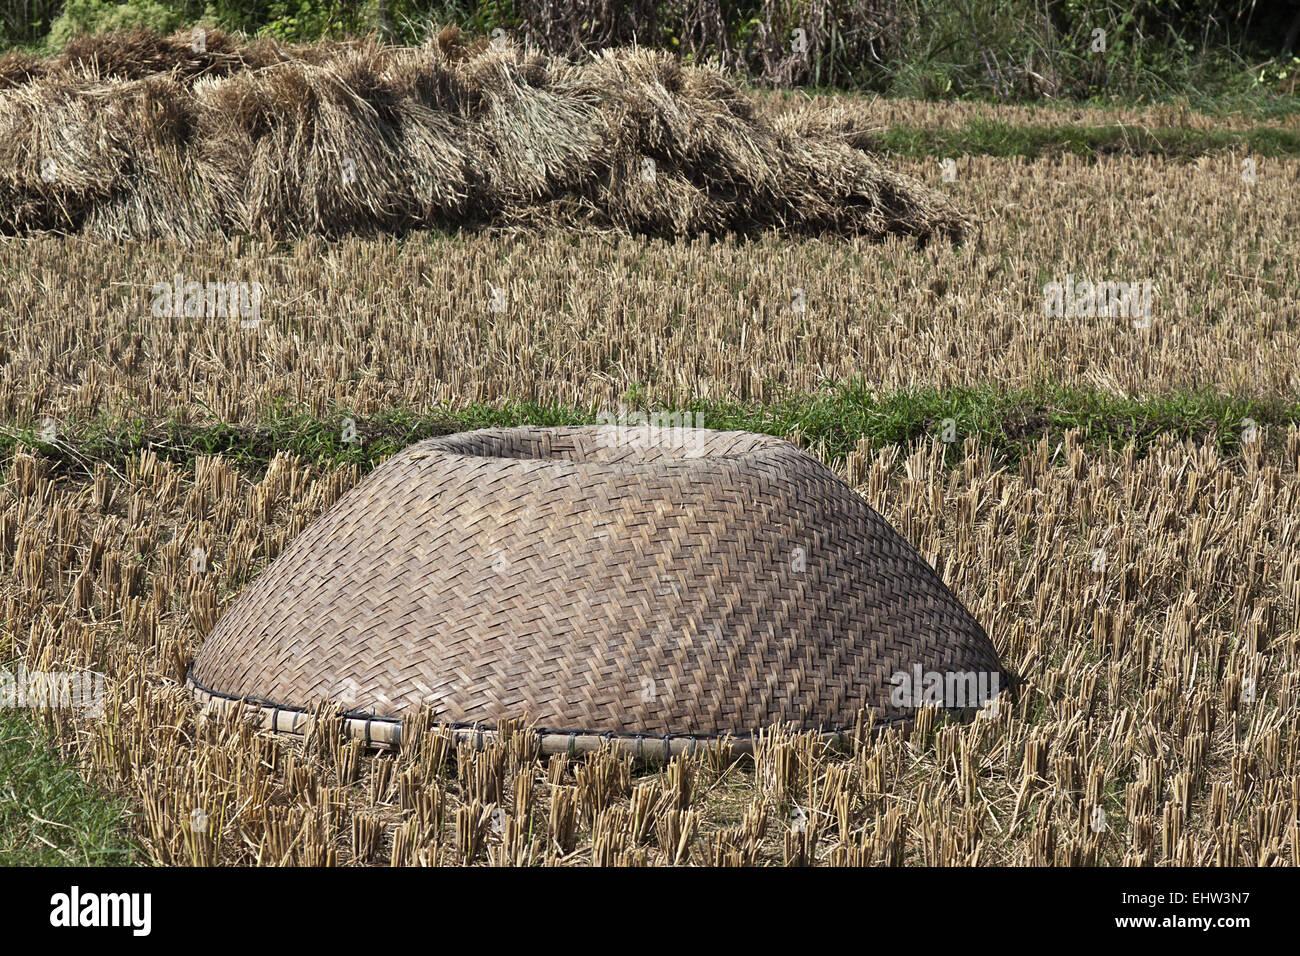 Rice harvest - Stock Image